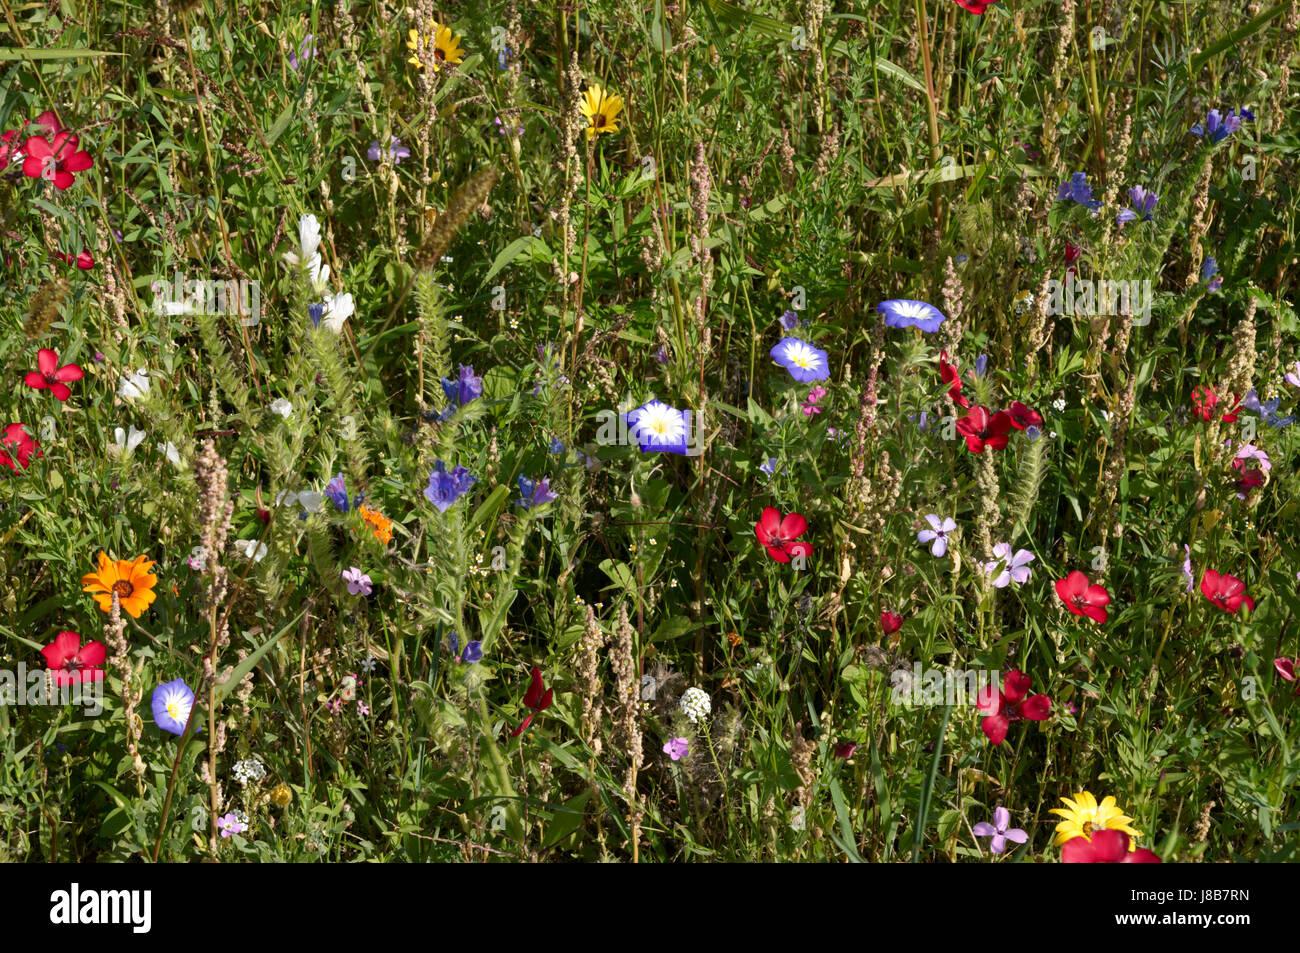 Color, colorido, magnífico, múltiples, ricamente coloreado, flores, flores, Foto de stock